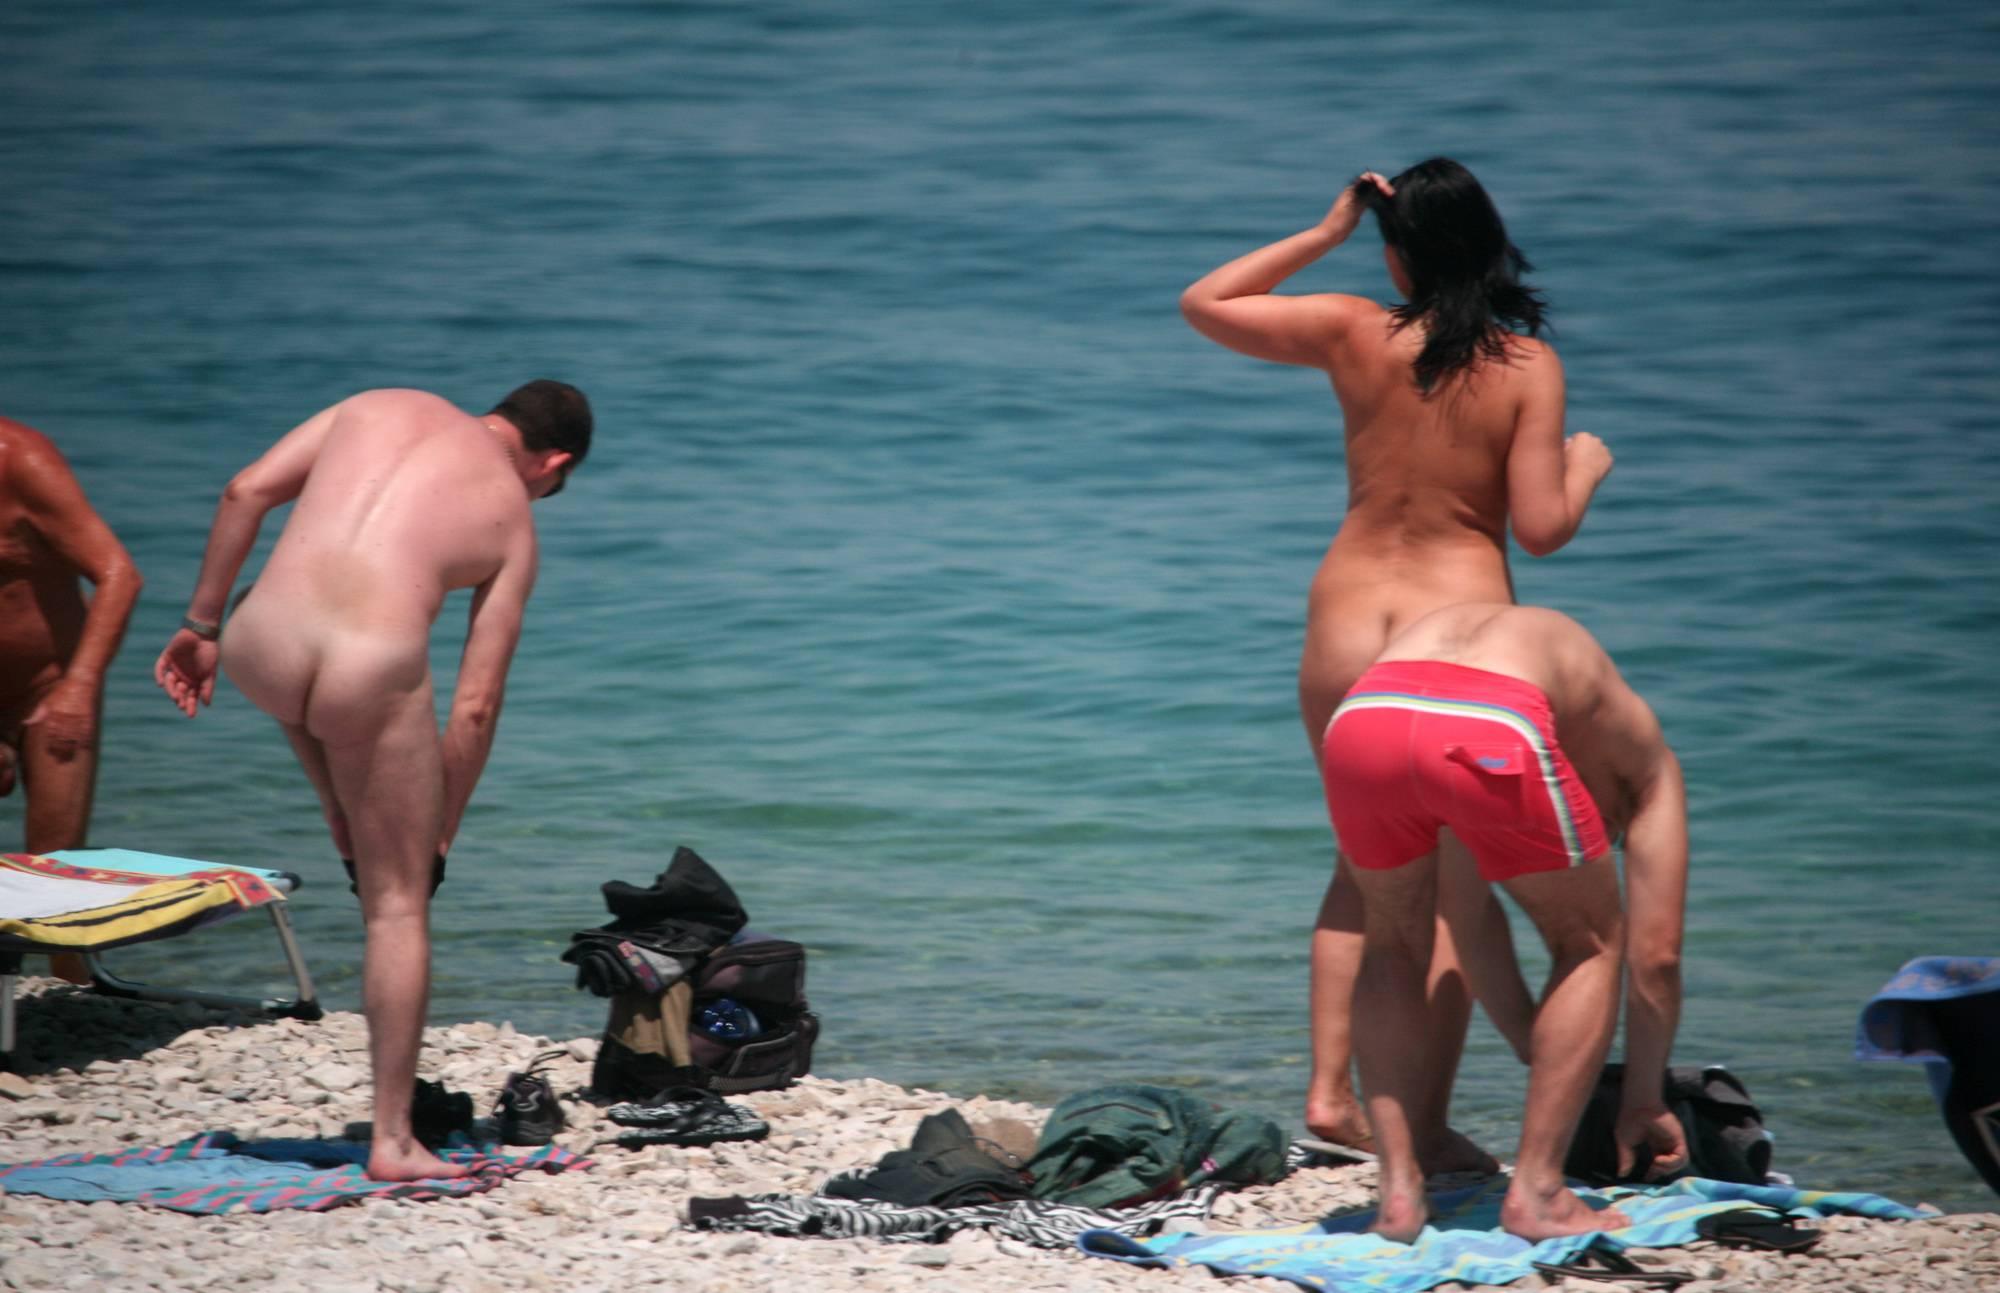 Purenudism-Friends Came on a Beach - 1